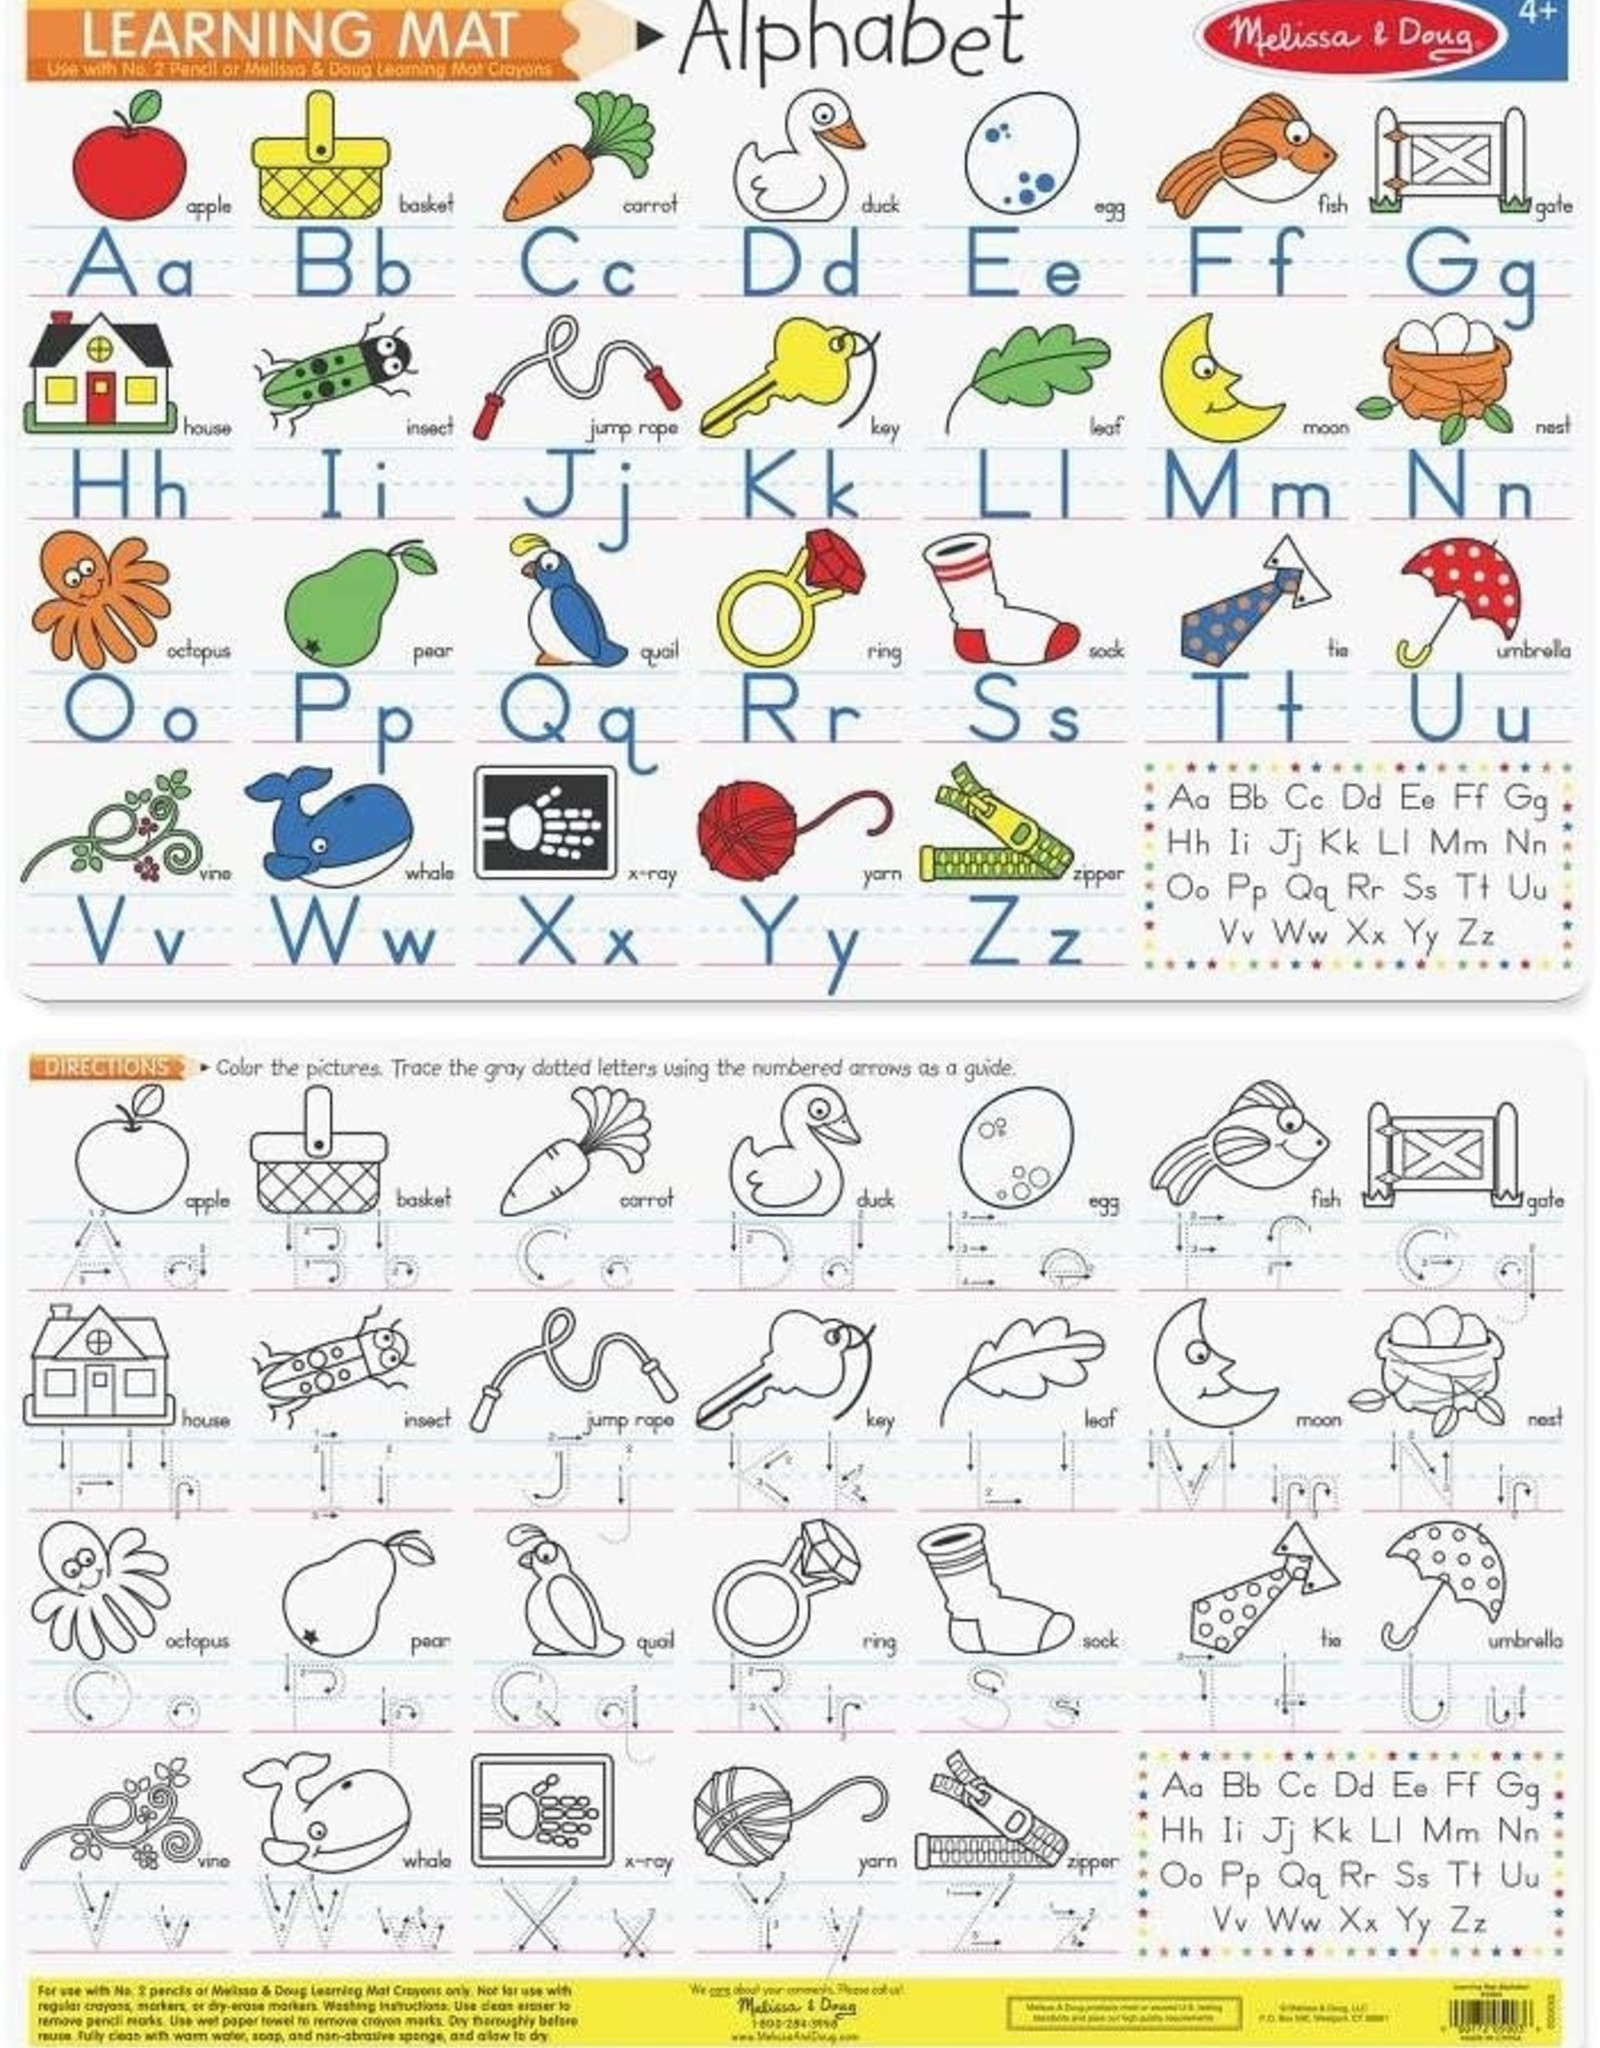 Melissa & Doug Alphabet Learning Mat